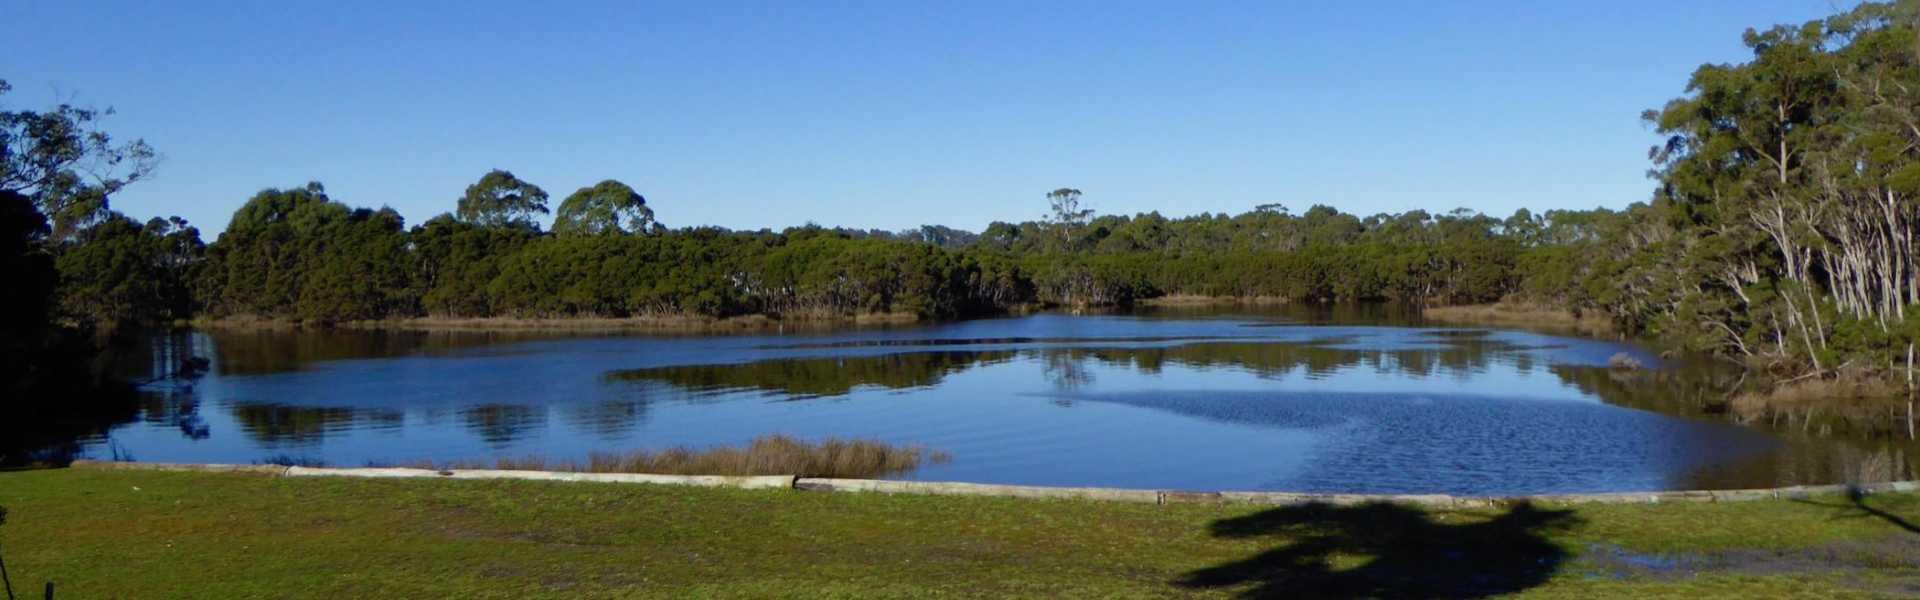 Kui Parks, Smithton, River Breeze Caravan & Cabin Park, River Side